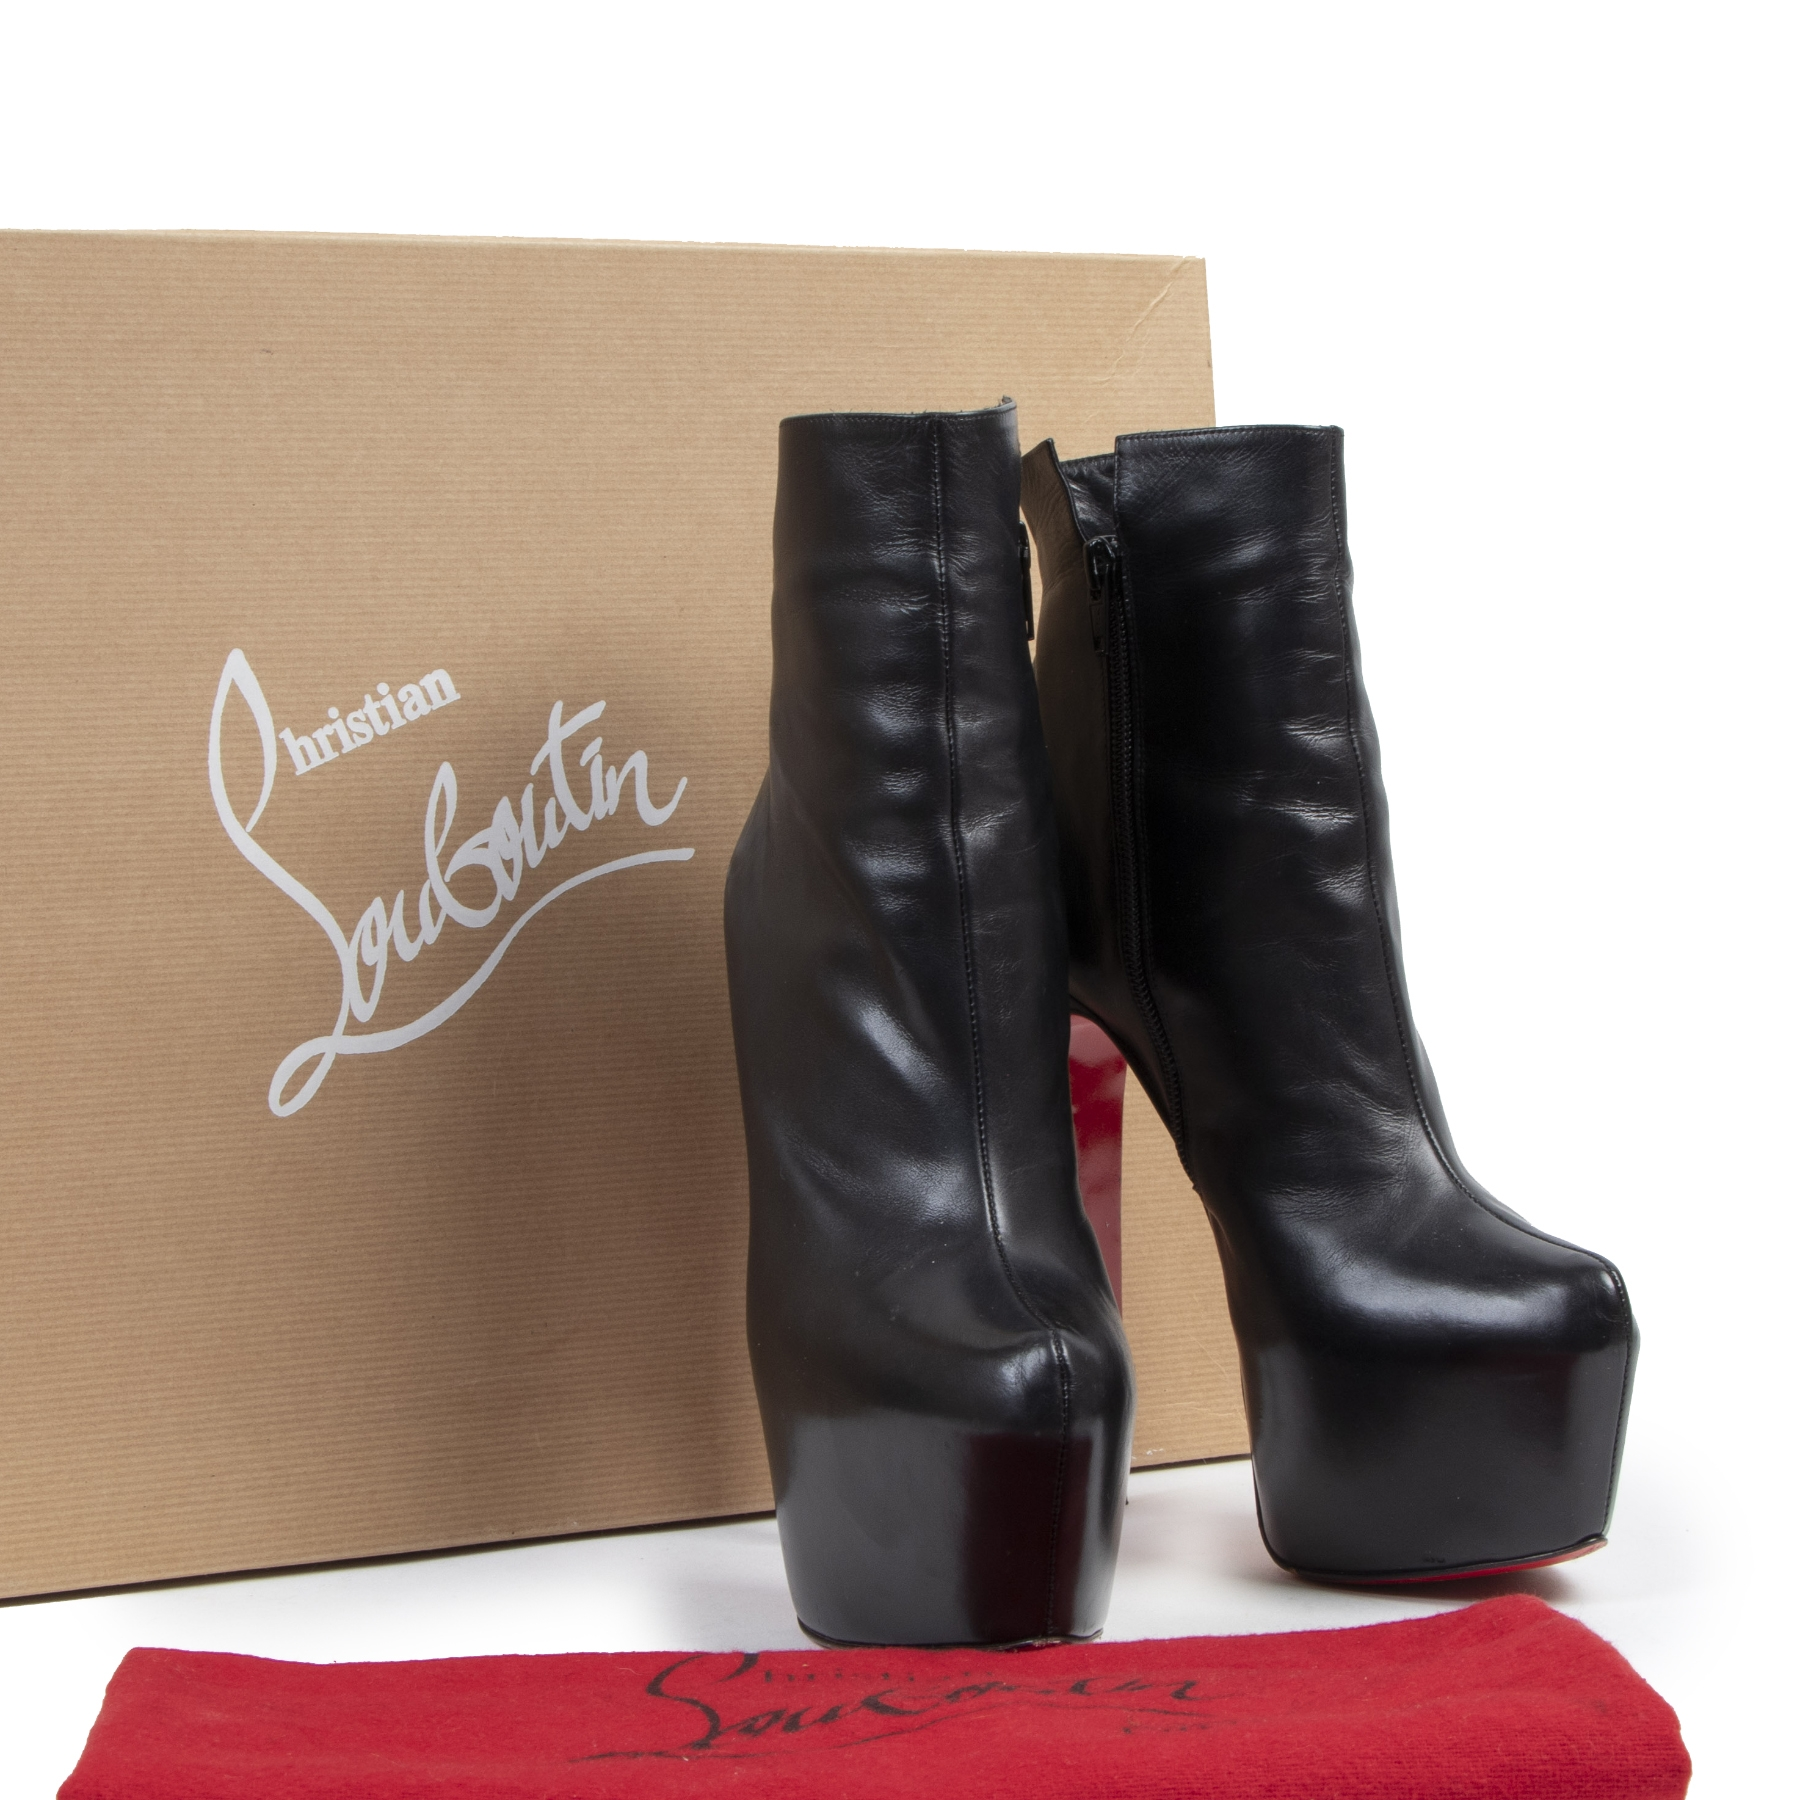 Authentic secondhand Christian Louboutin Daffodile Platform Ankle Boots - Size 38 designer shoes pumps luxury vintage webshop fashion designer brands